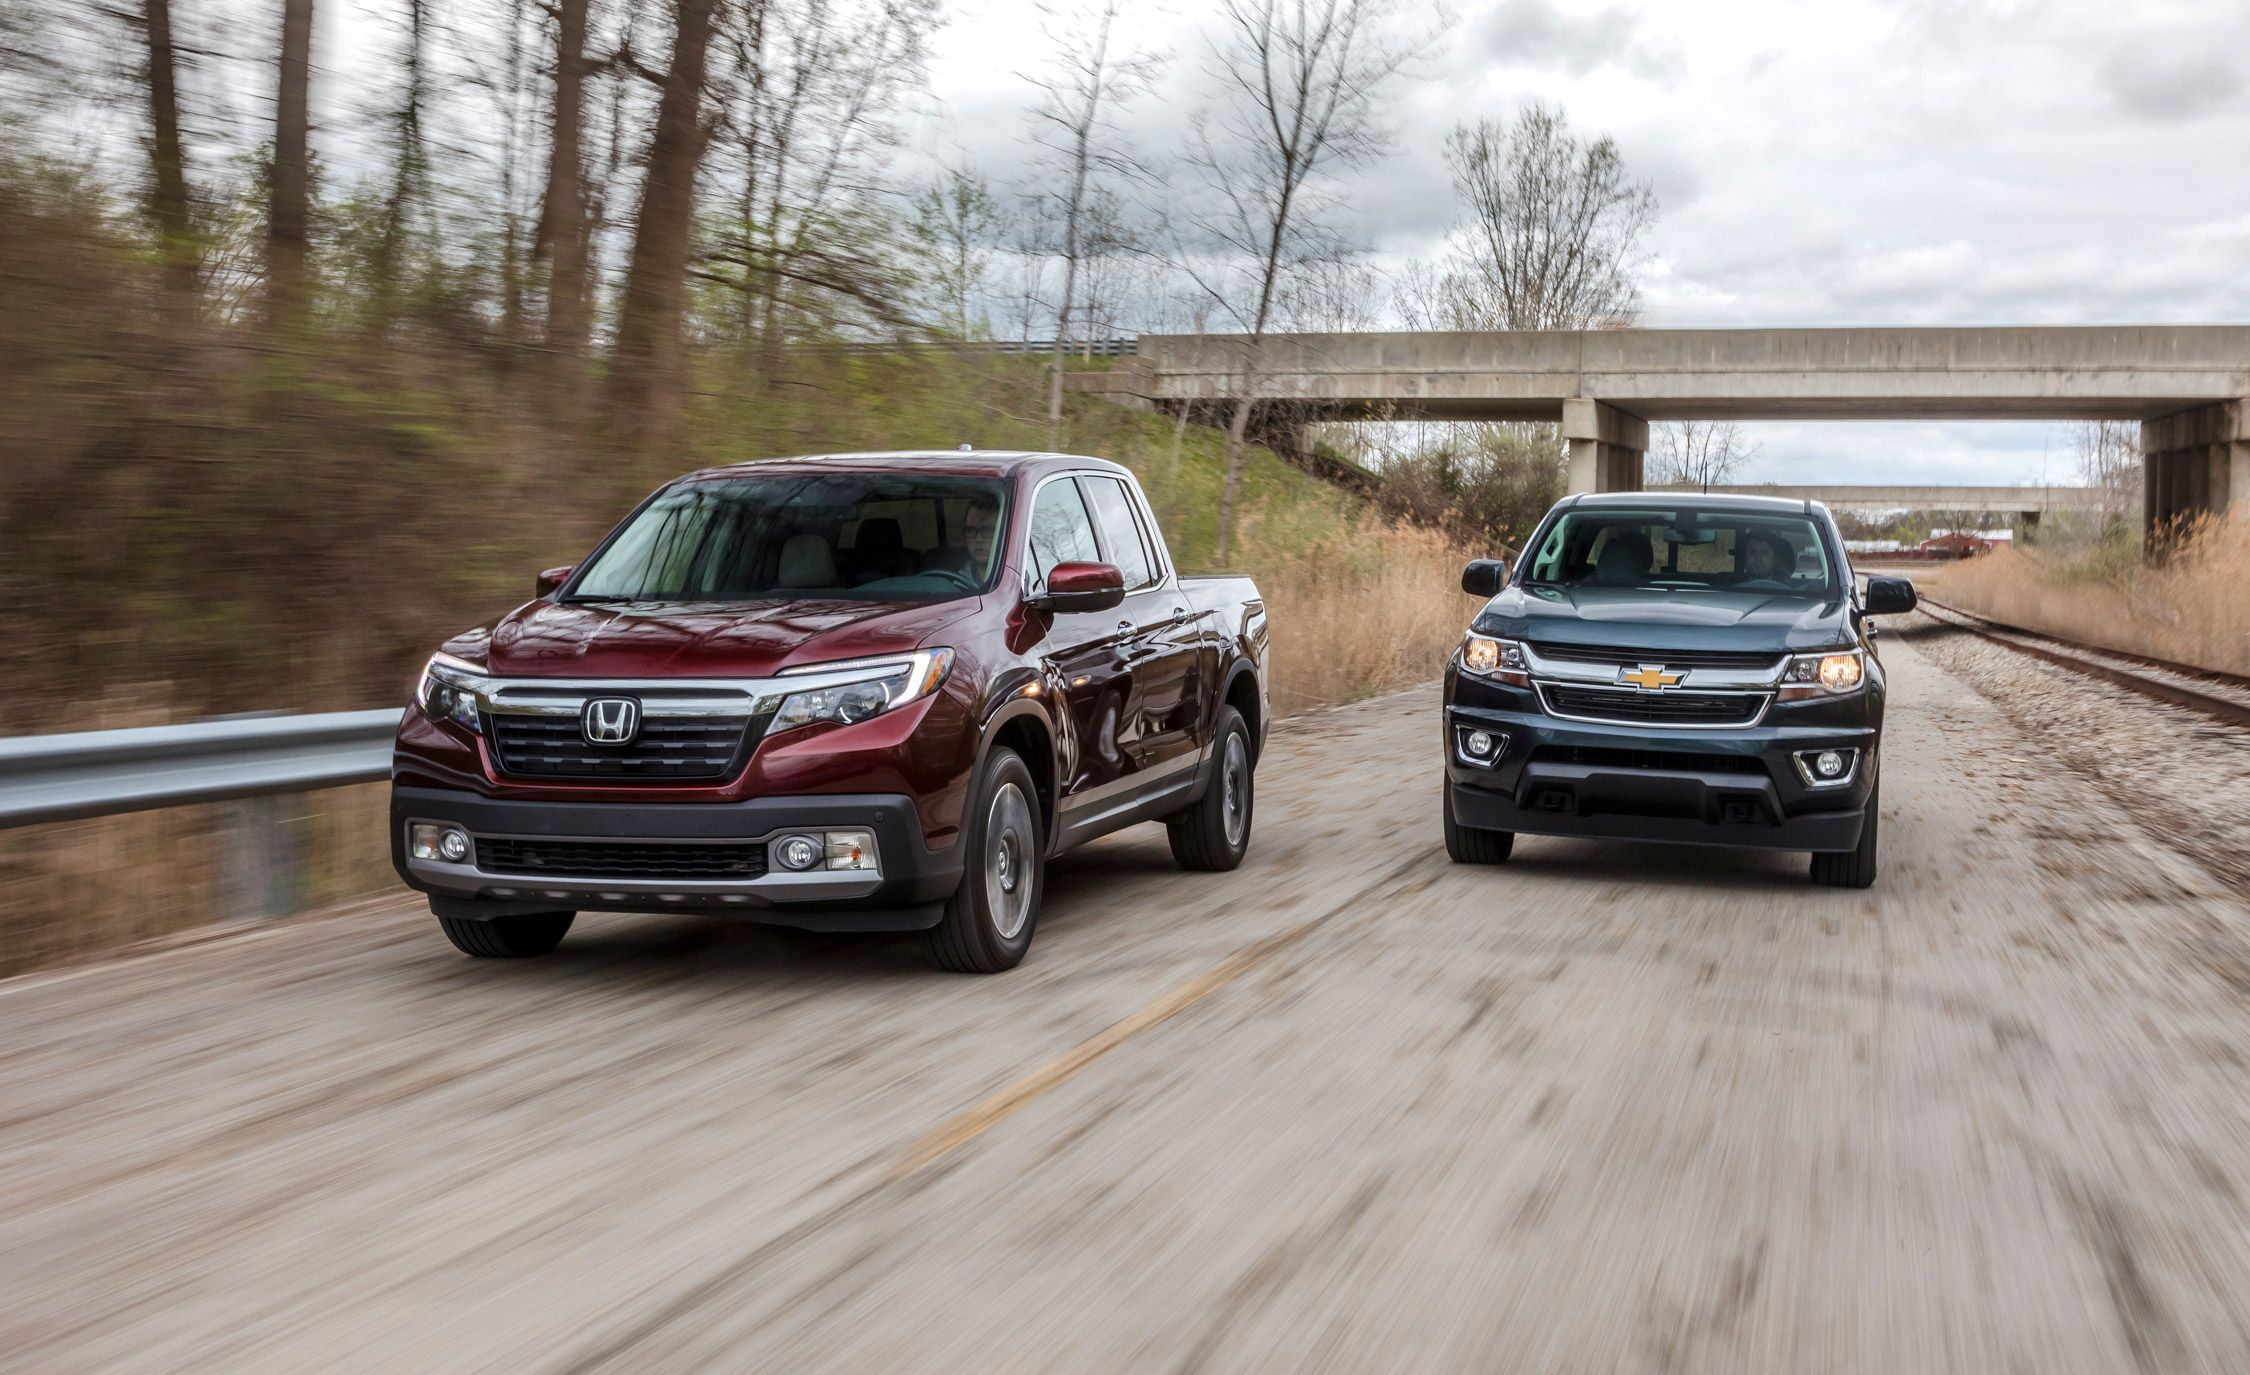 There is true design your landscape 04 honda - 2017 Chevrolet Colorado Lt Crew Cab 4wd Vs 2017 Honda Ridgeline Rtl E Awd